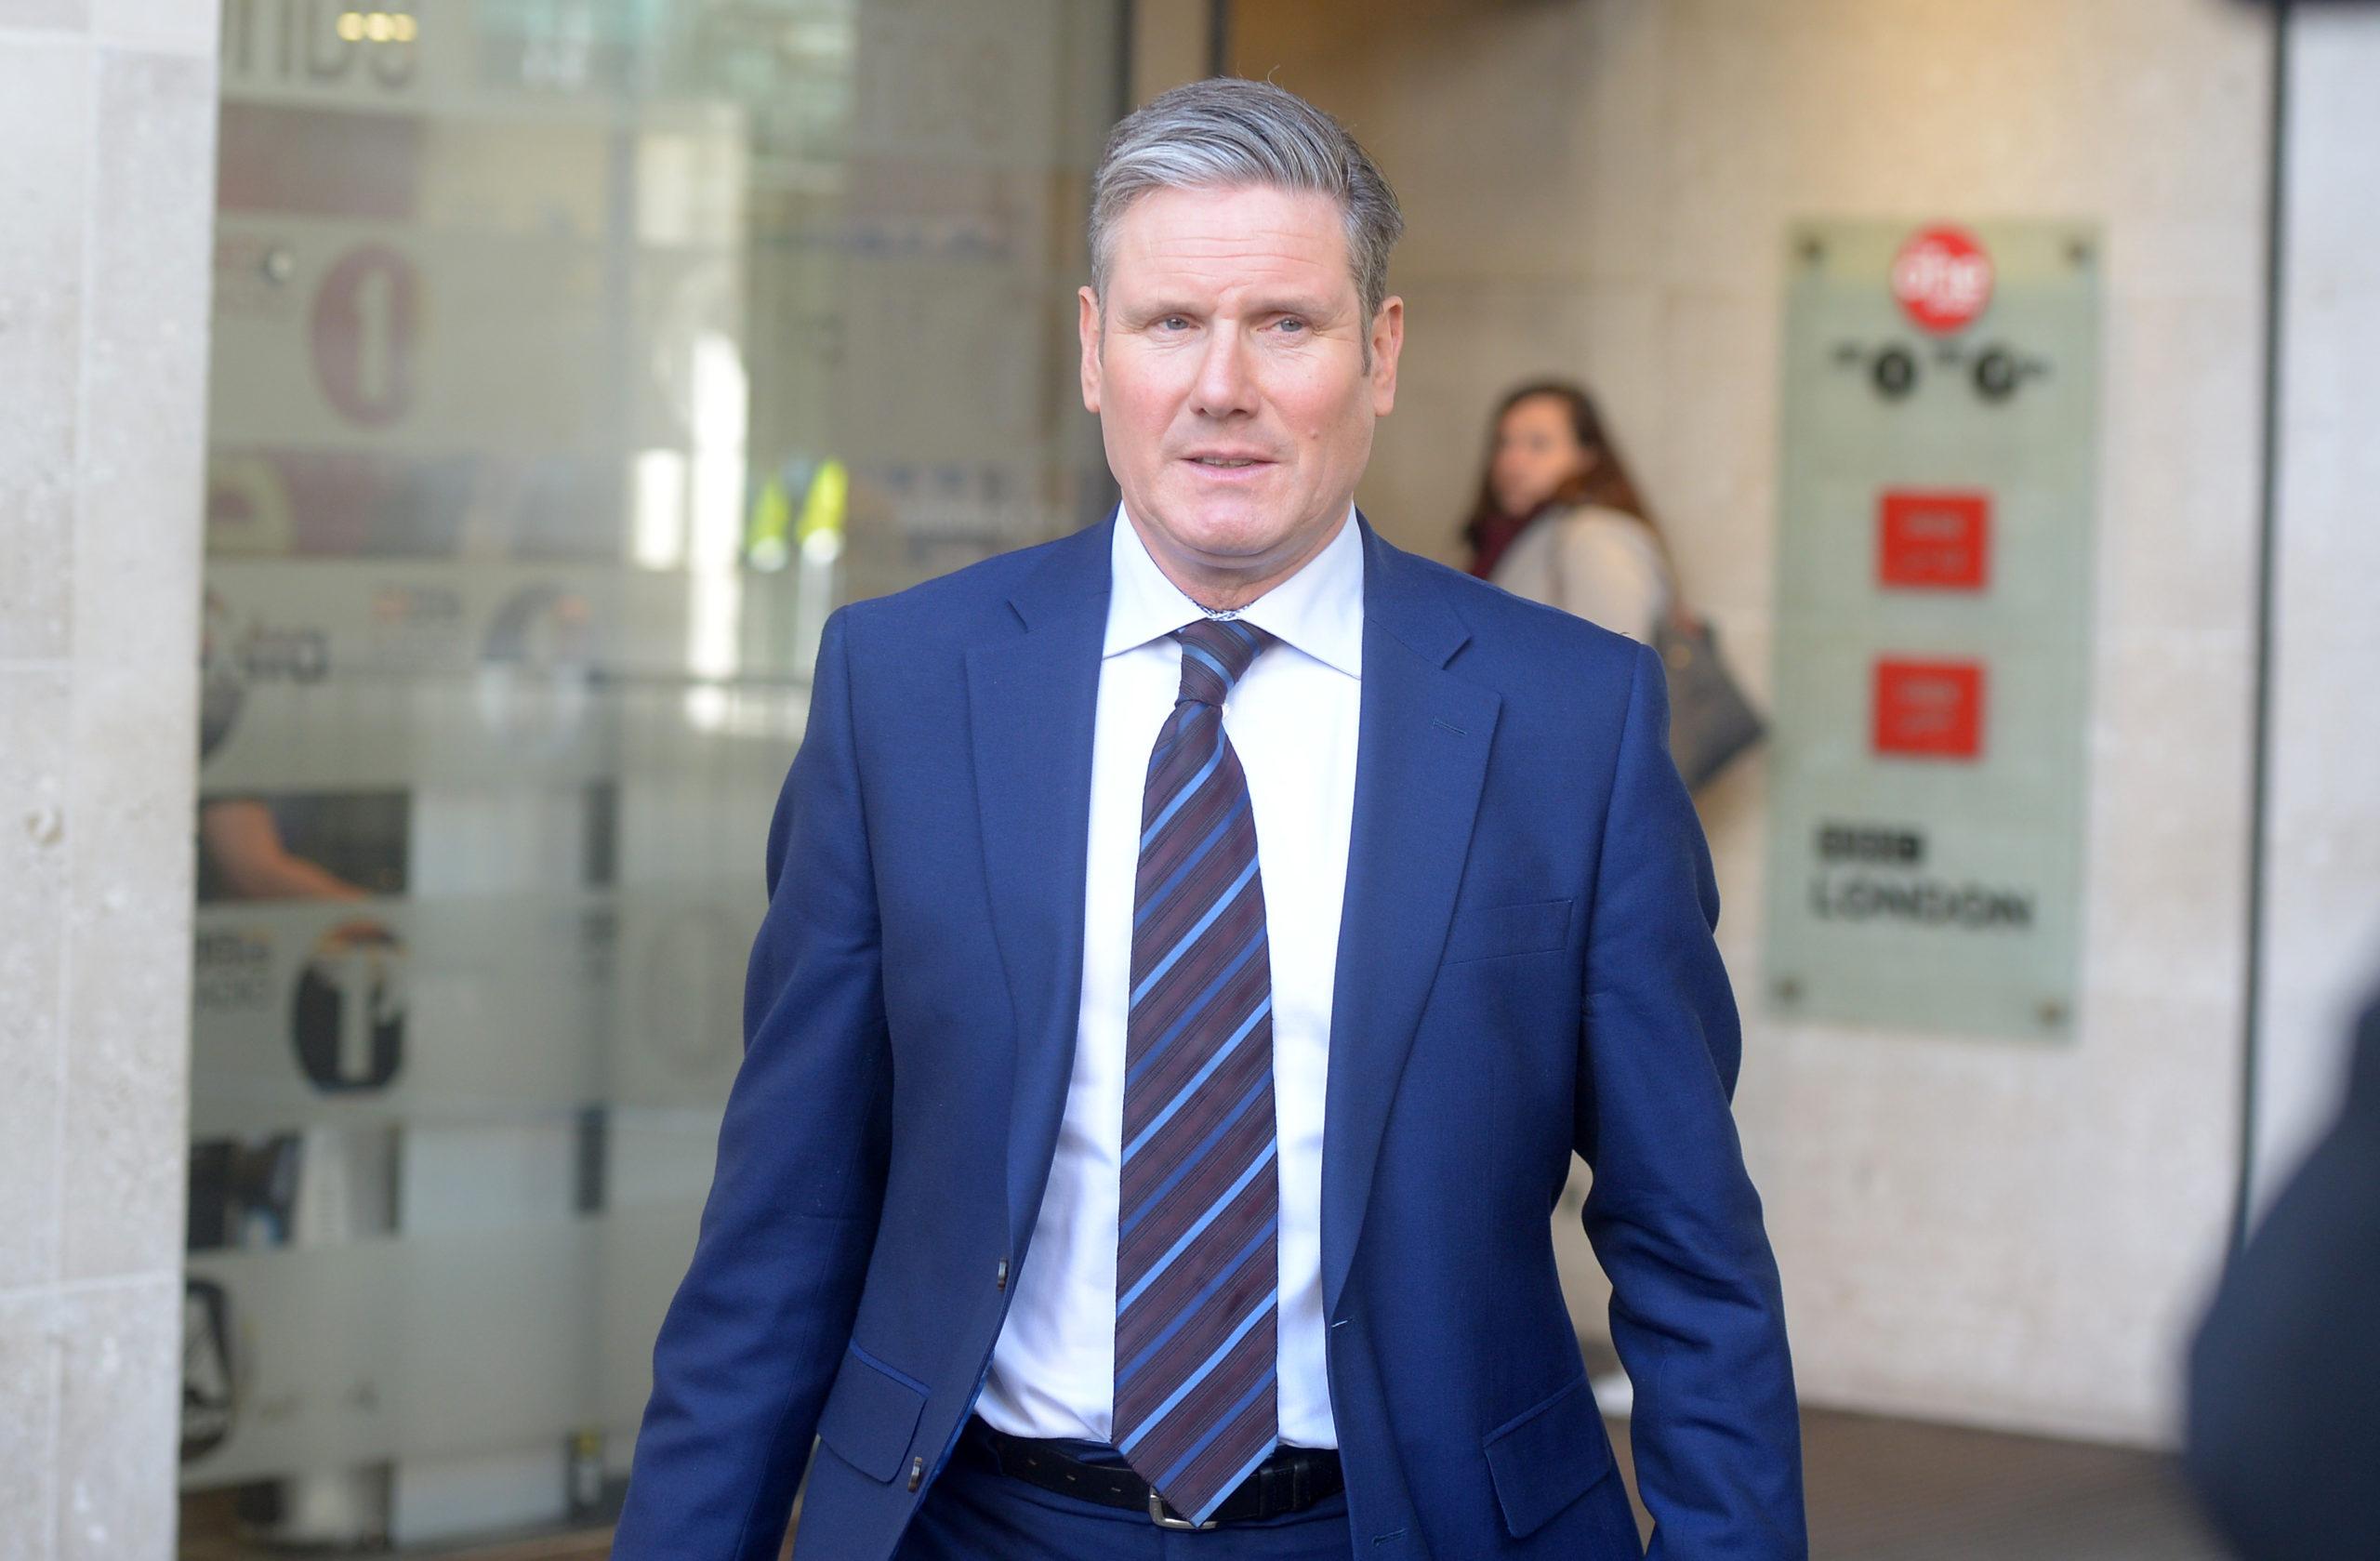 UK Chancellor to cut coronavirus furlough scheme over addiction fears